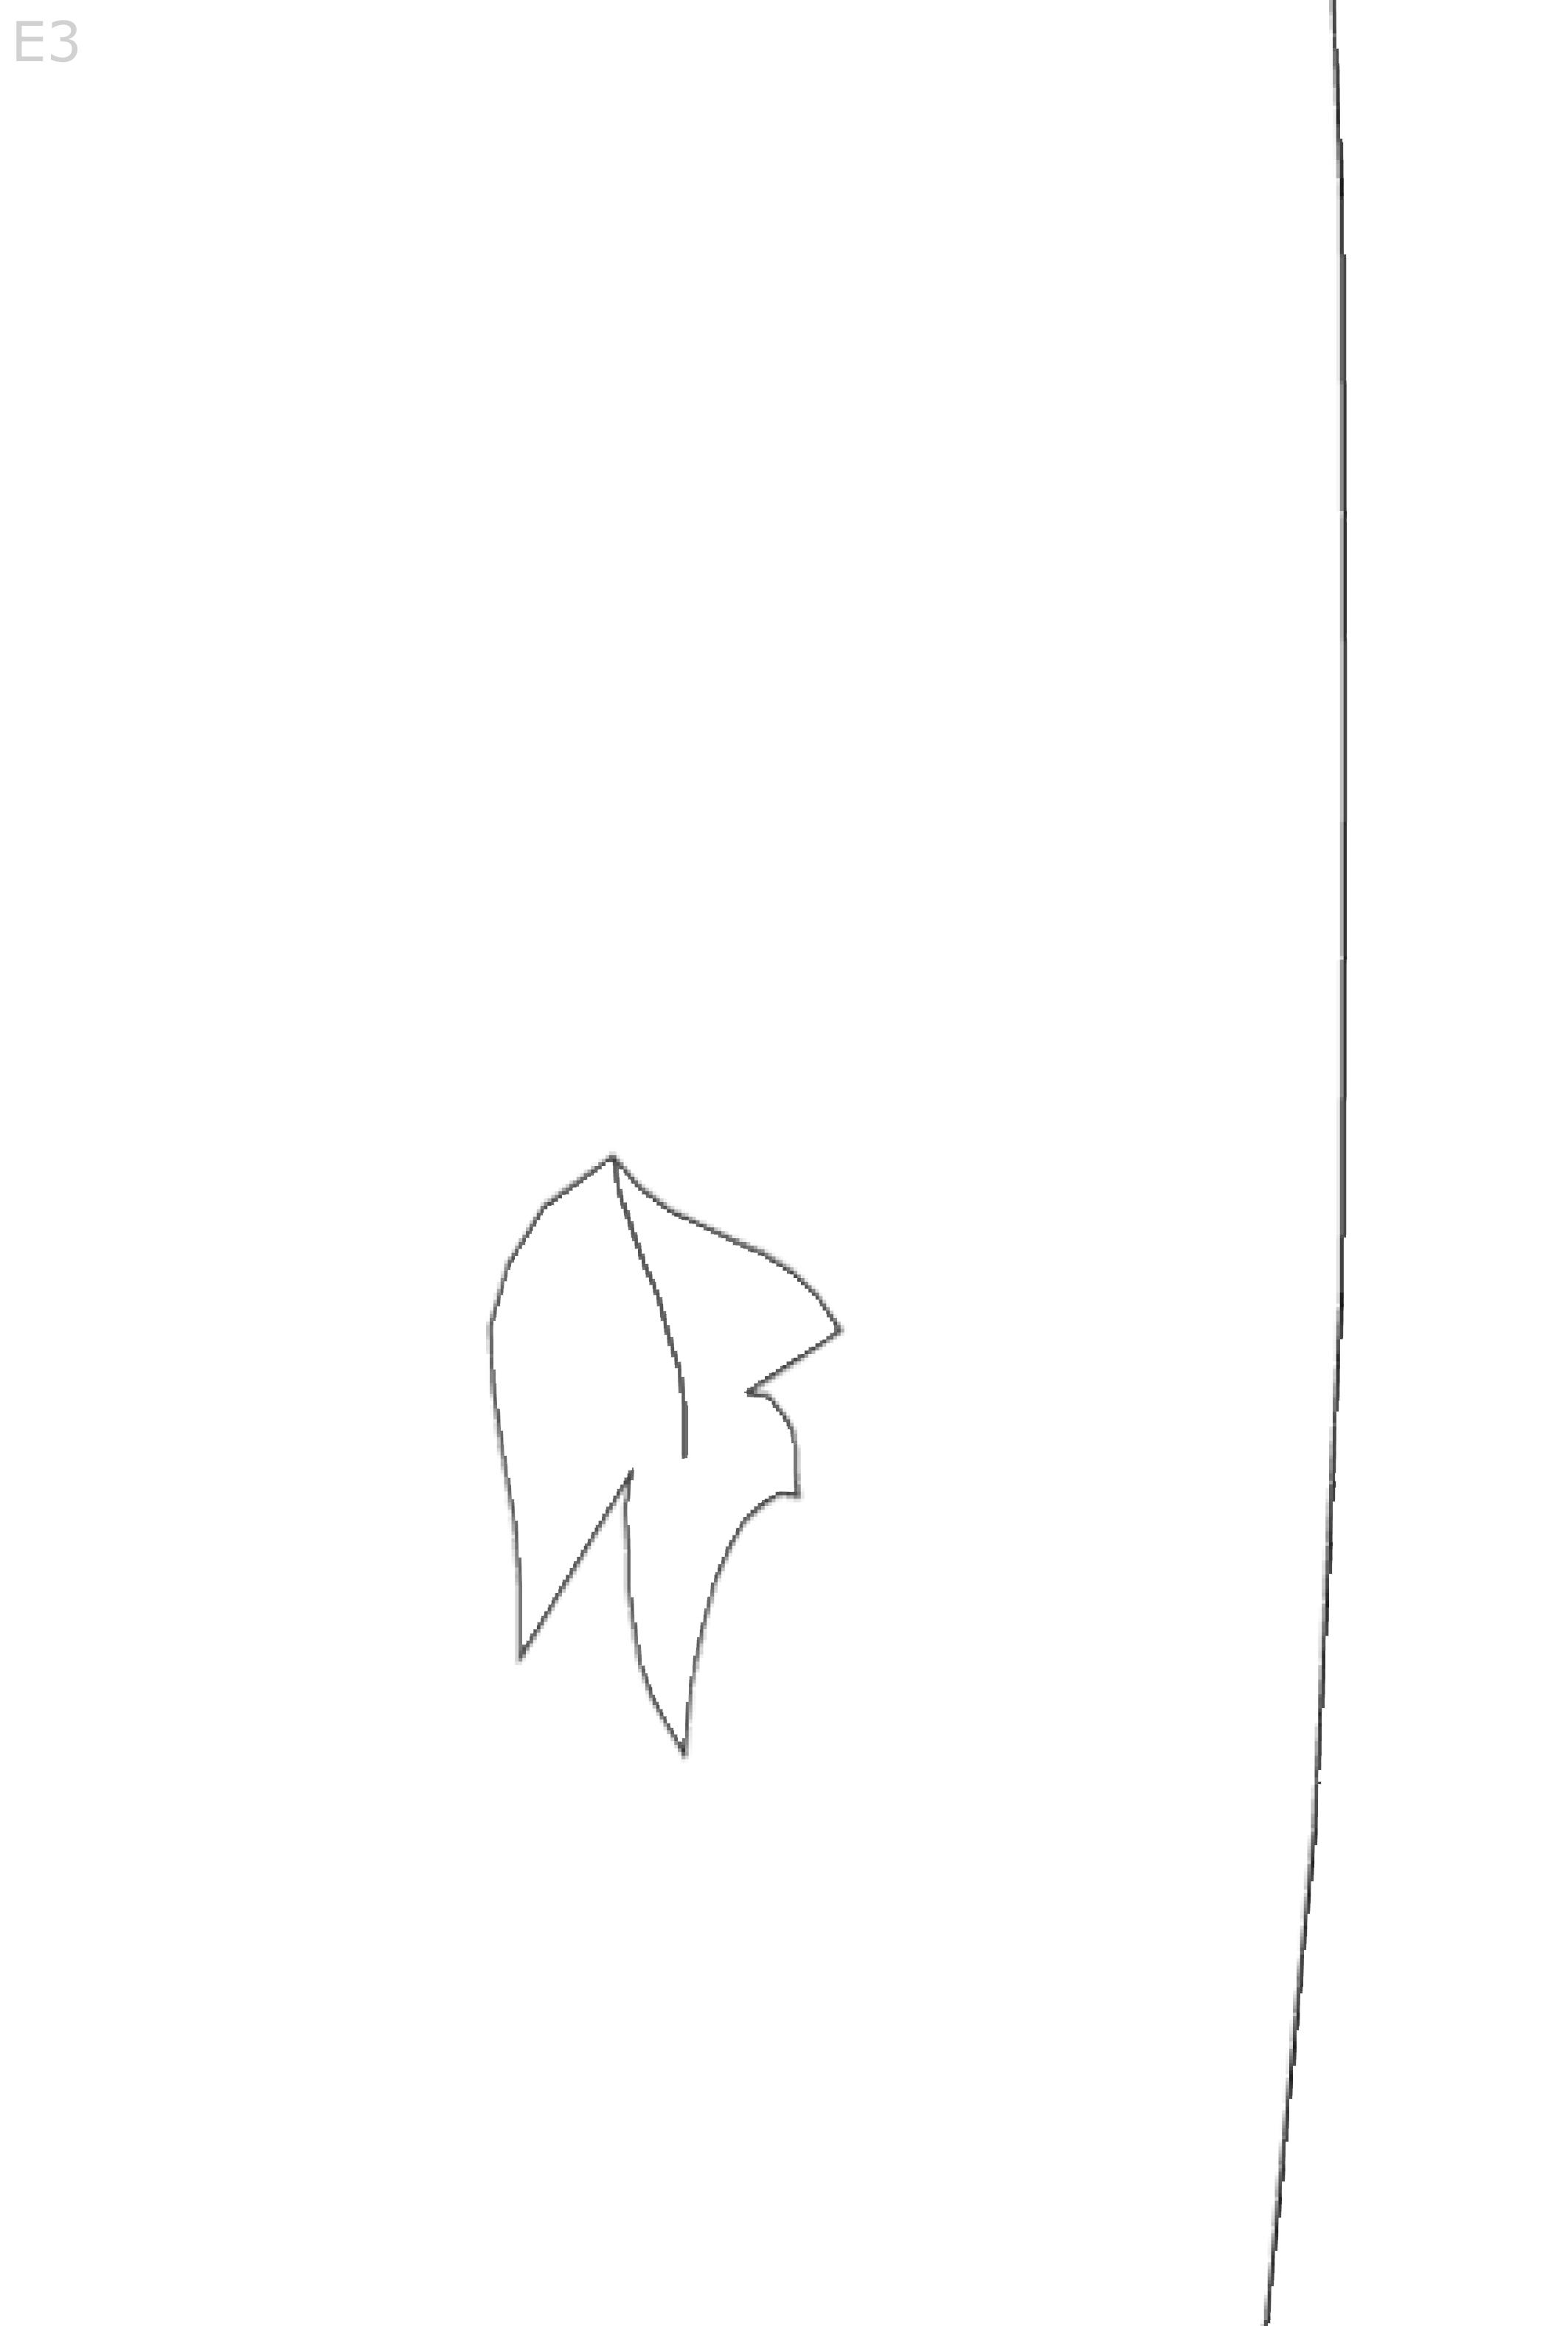 Albero-Autunno-BN-E-3